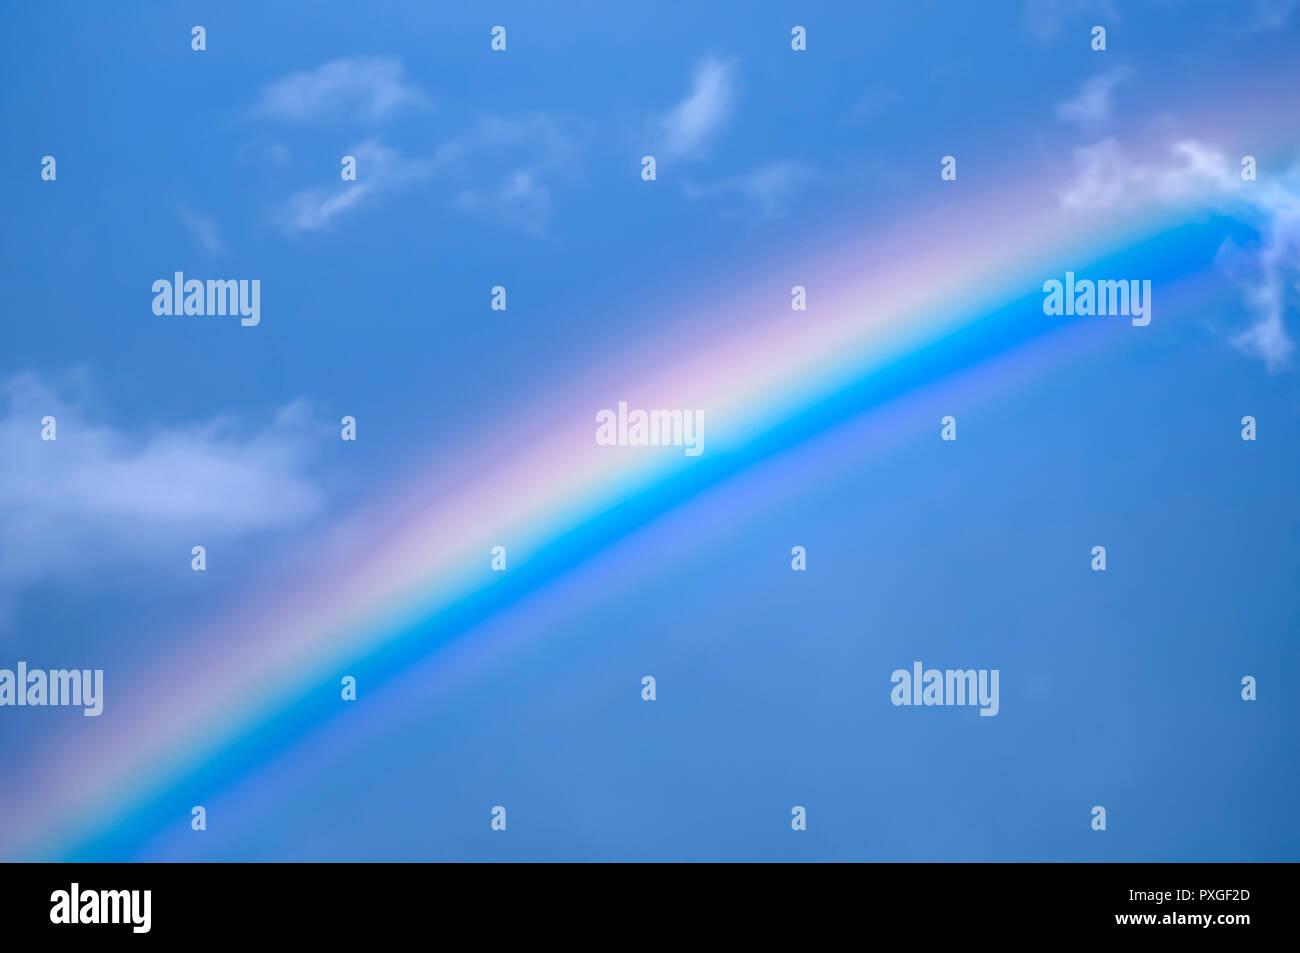 Rainbow on blue sky background Stock Photo